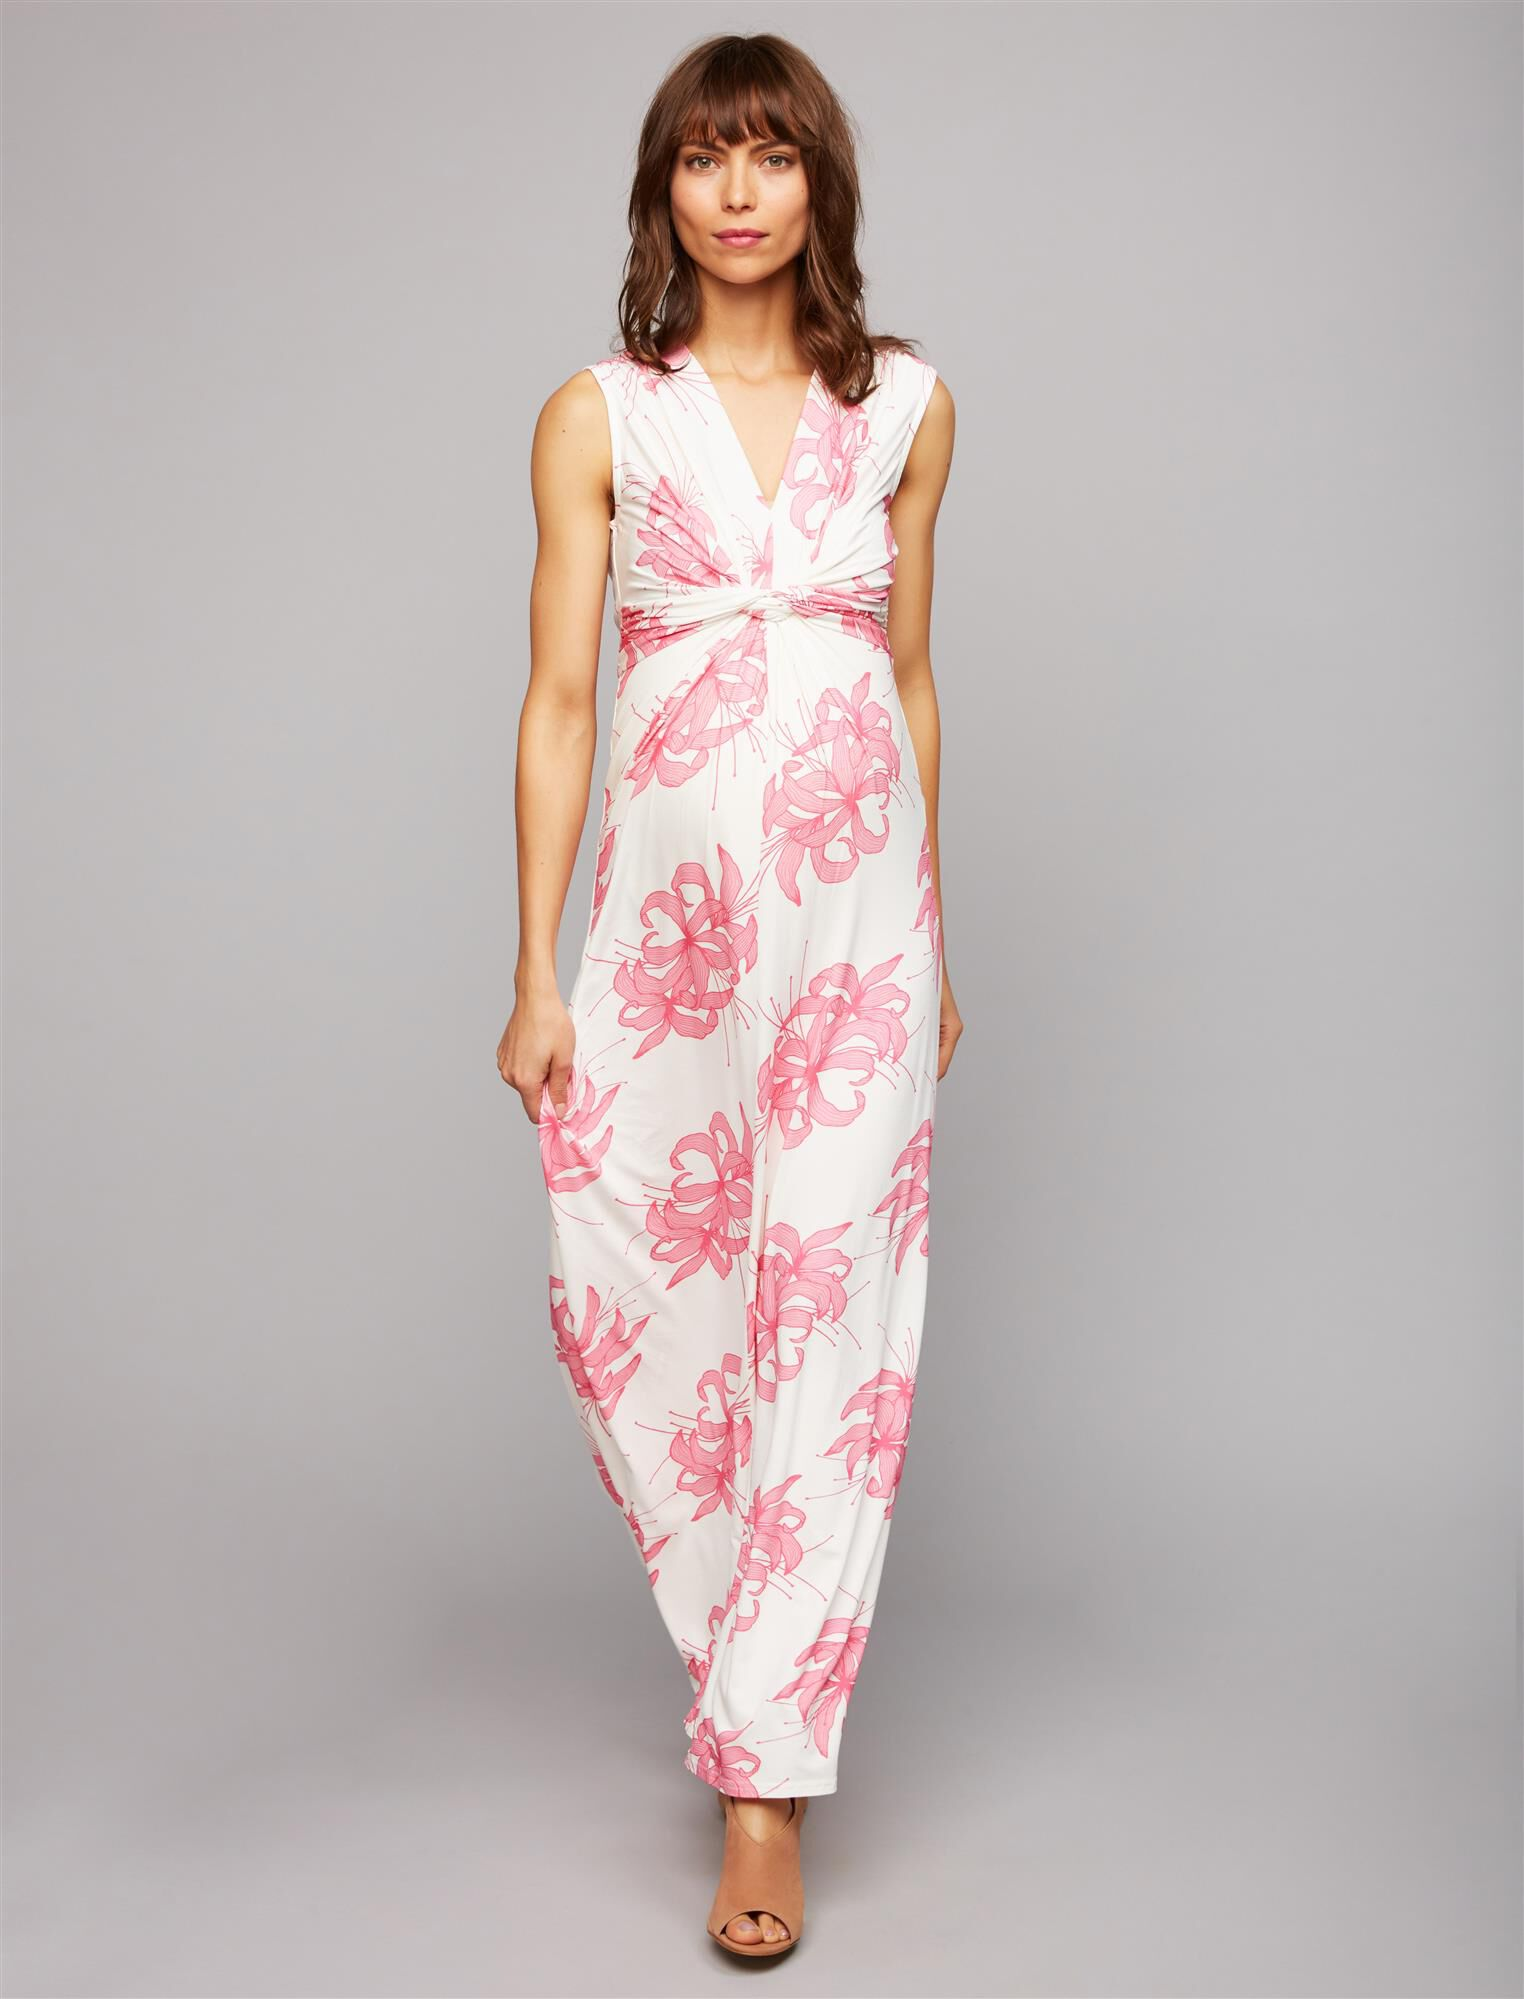 Madderson Serena Maternity Maxi Dress